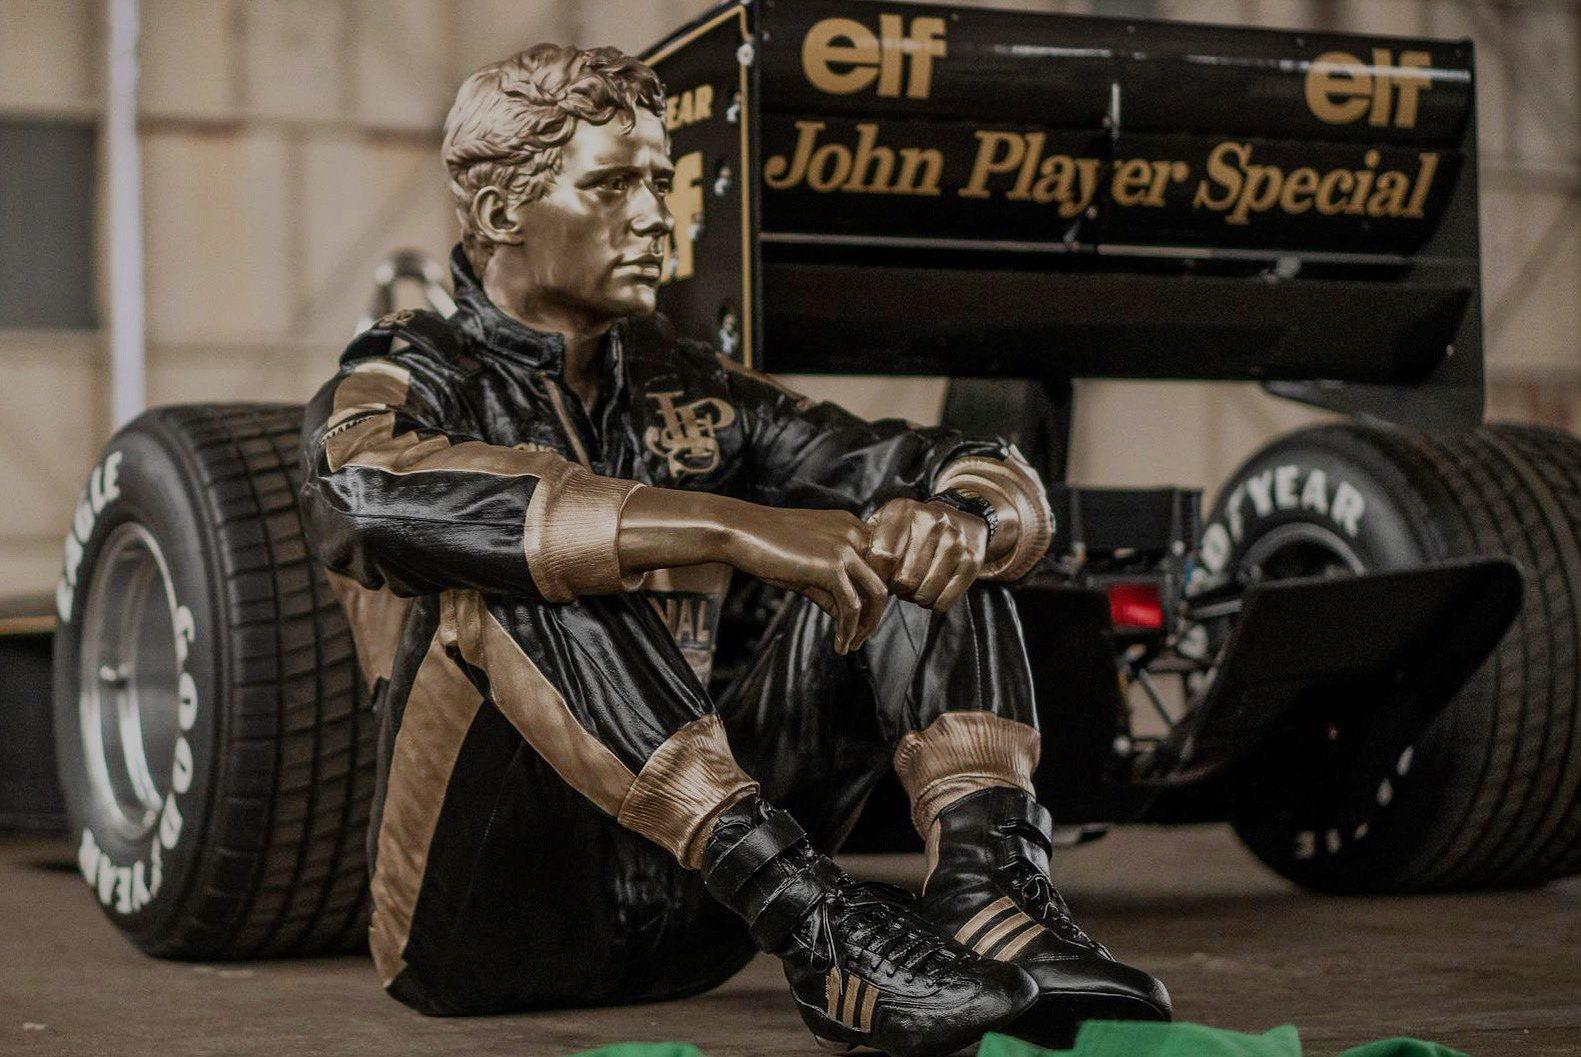 Sculptor Paul Oz unveils stunning new Senna bronze